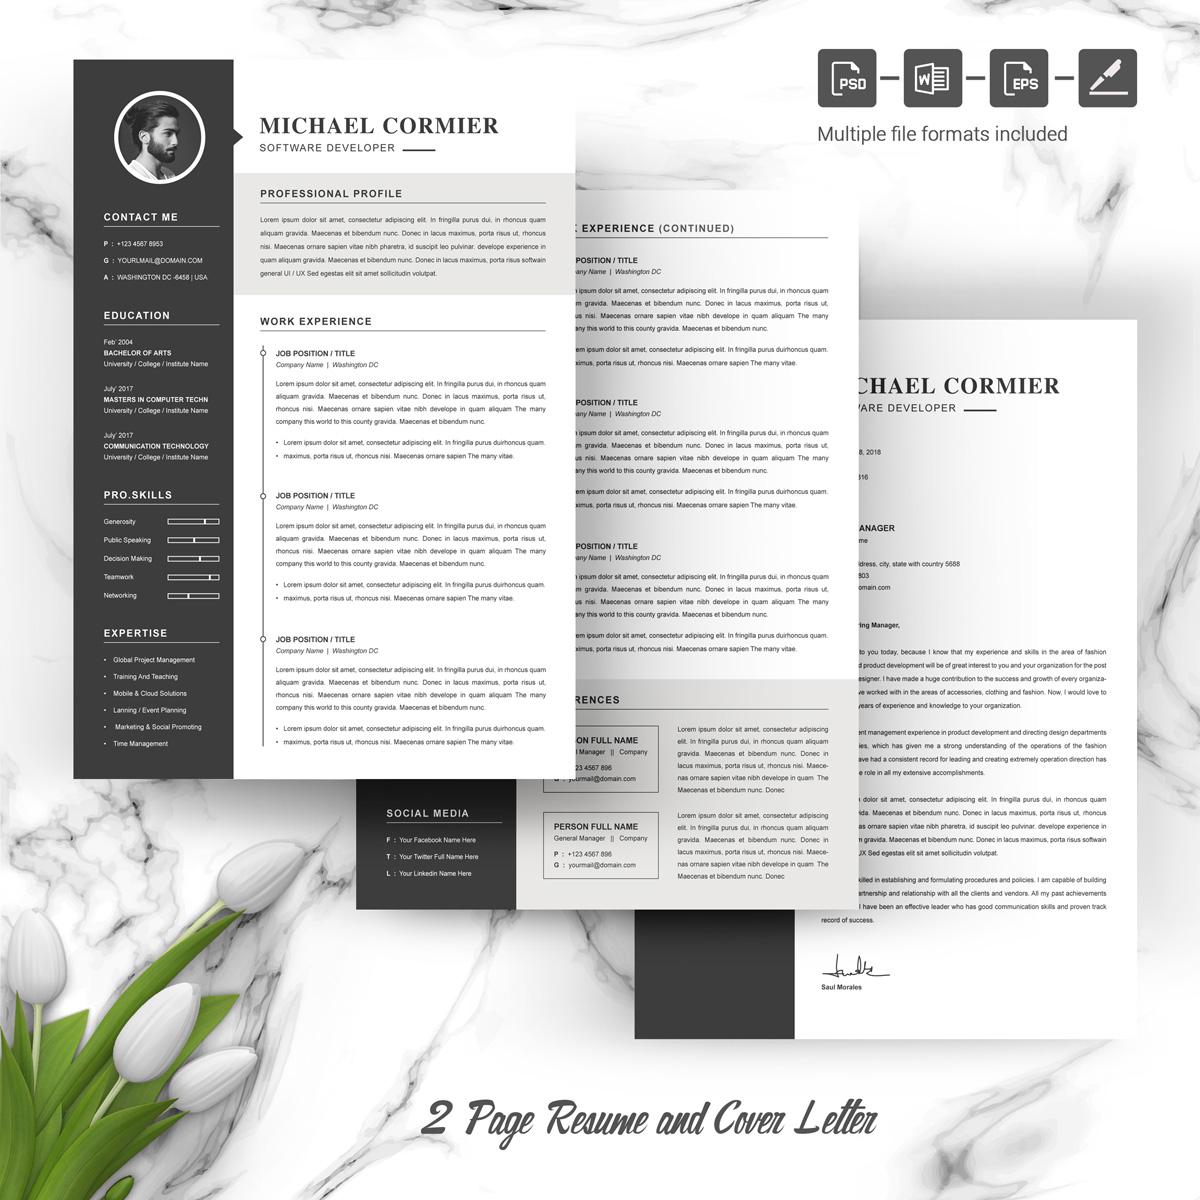 https://s3u.tmimgcdn.com/1860567-1561008937314_04_3-Pages-Free-Resume-Design-Template.jpg